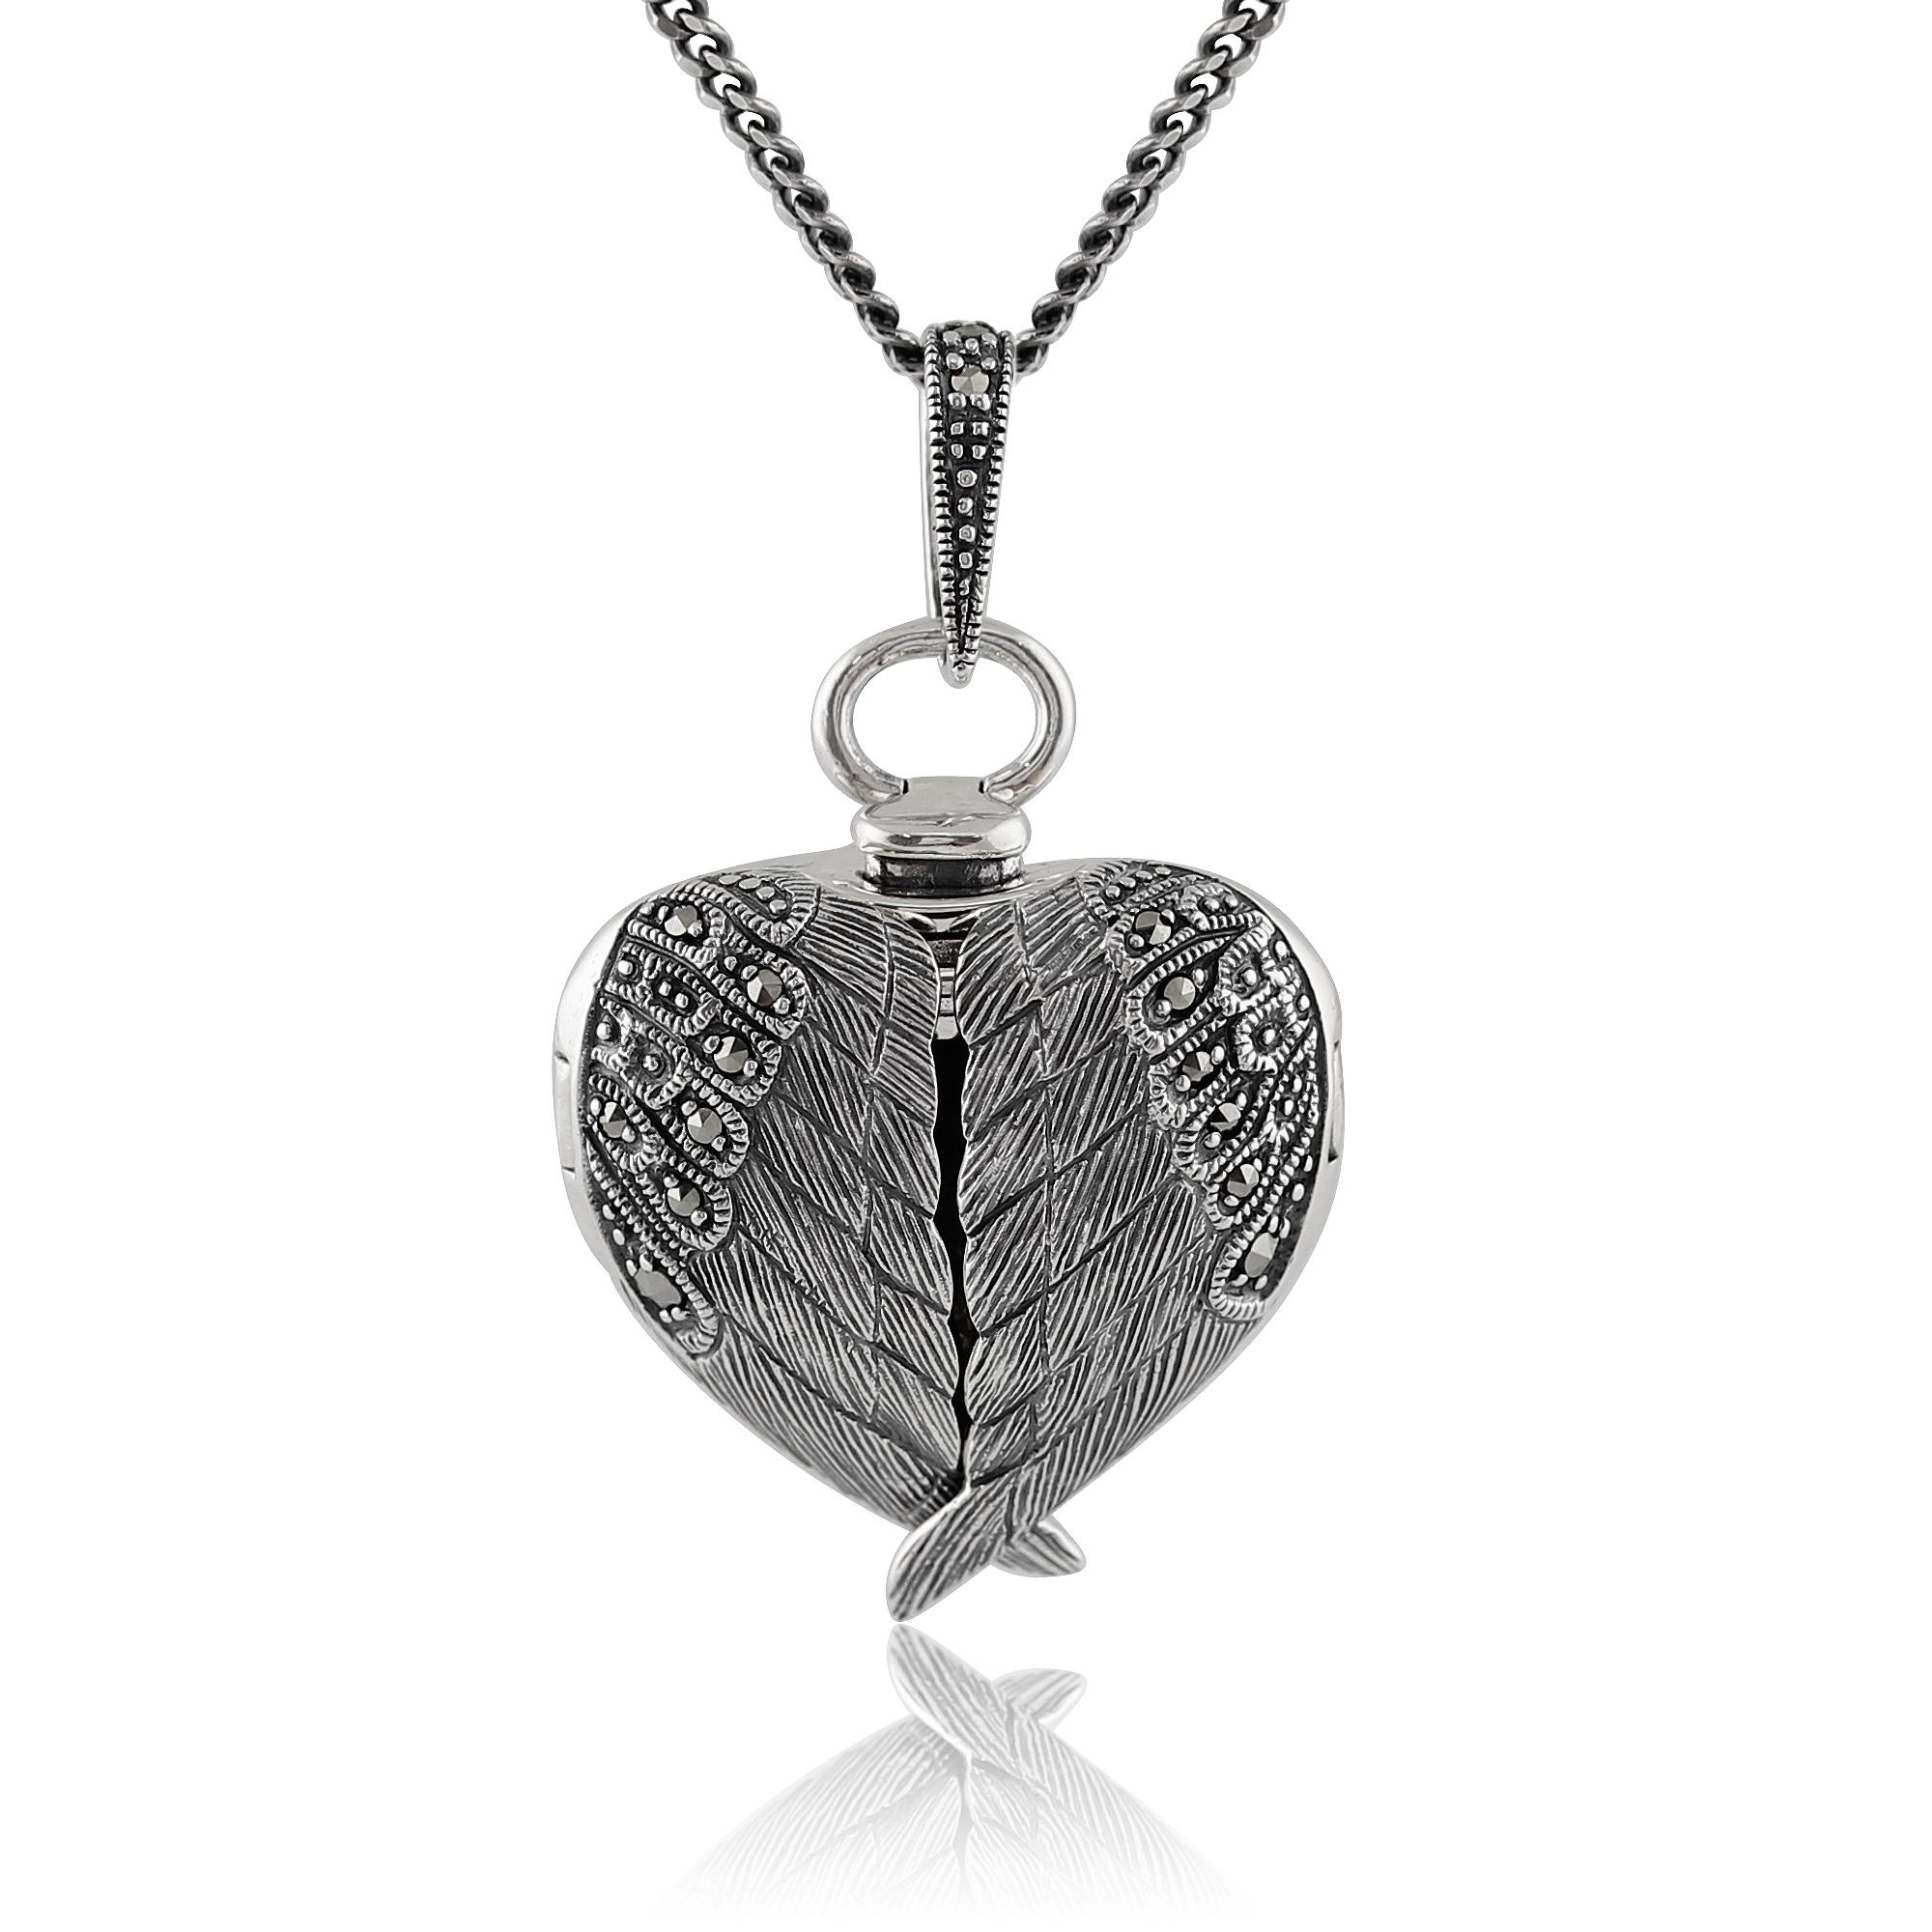 gemondo sterling silver marcasite angel wing heart. Black Bedroom Furniture Sets. Home Design Ideas